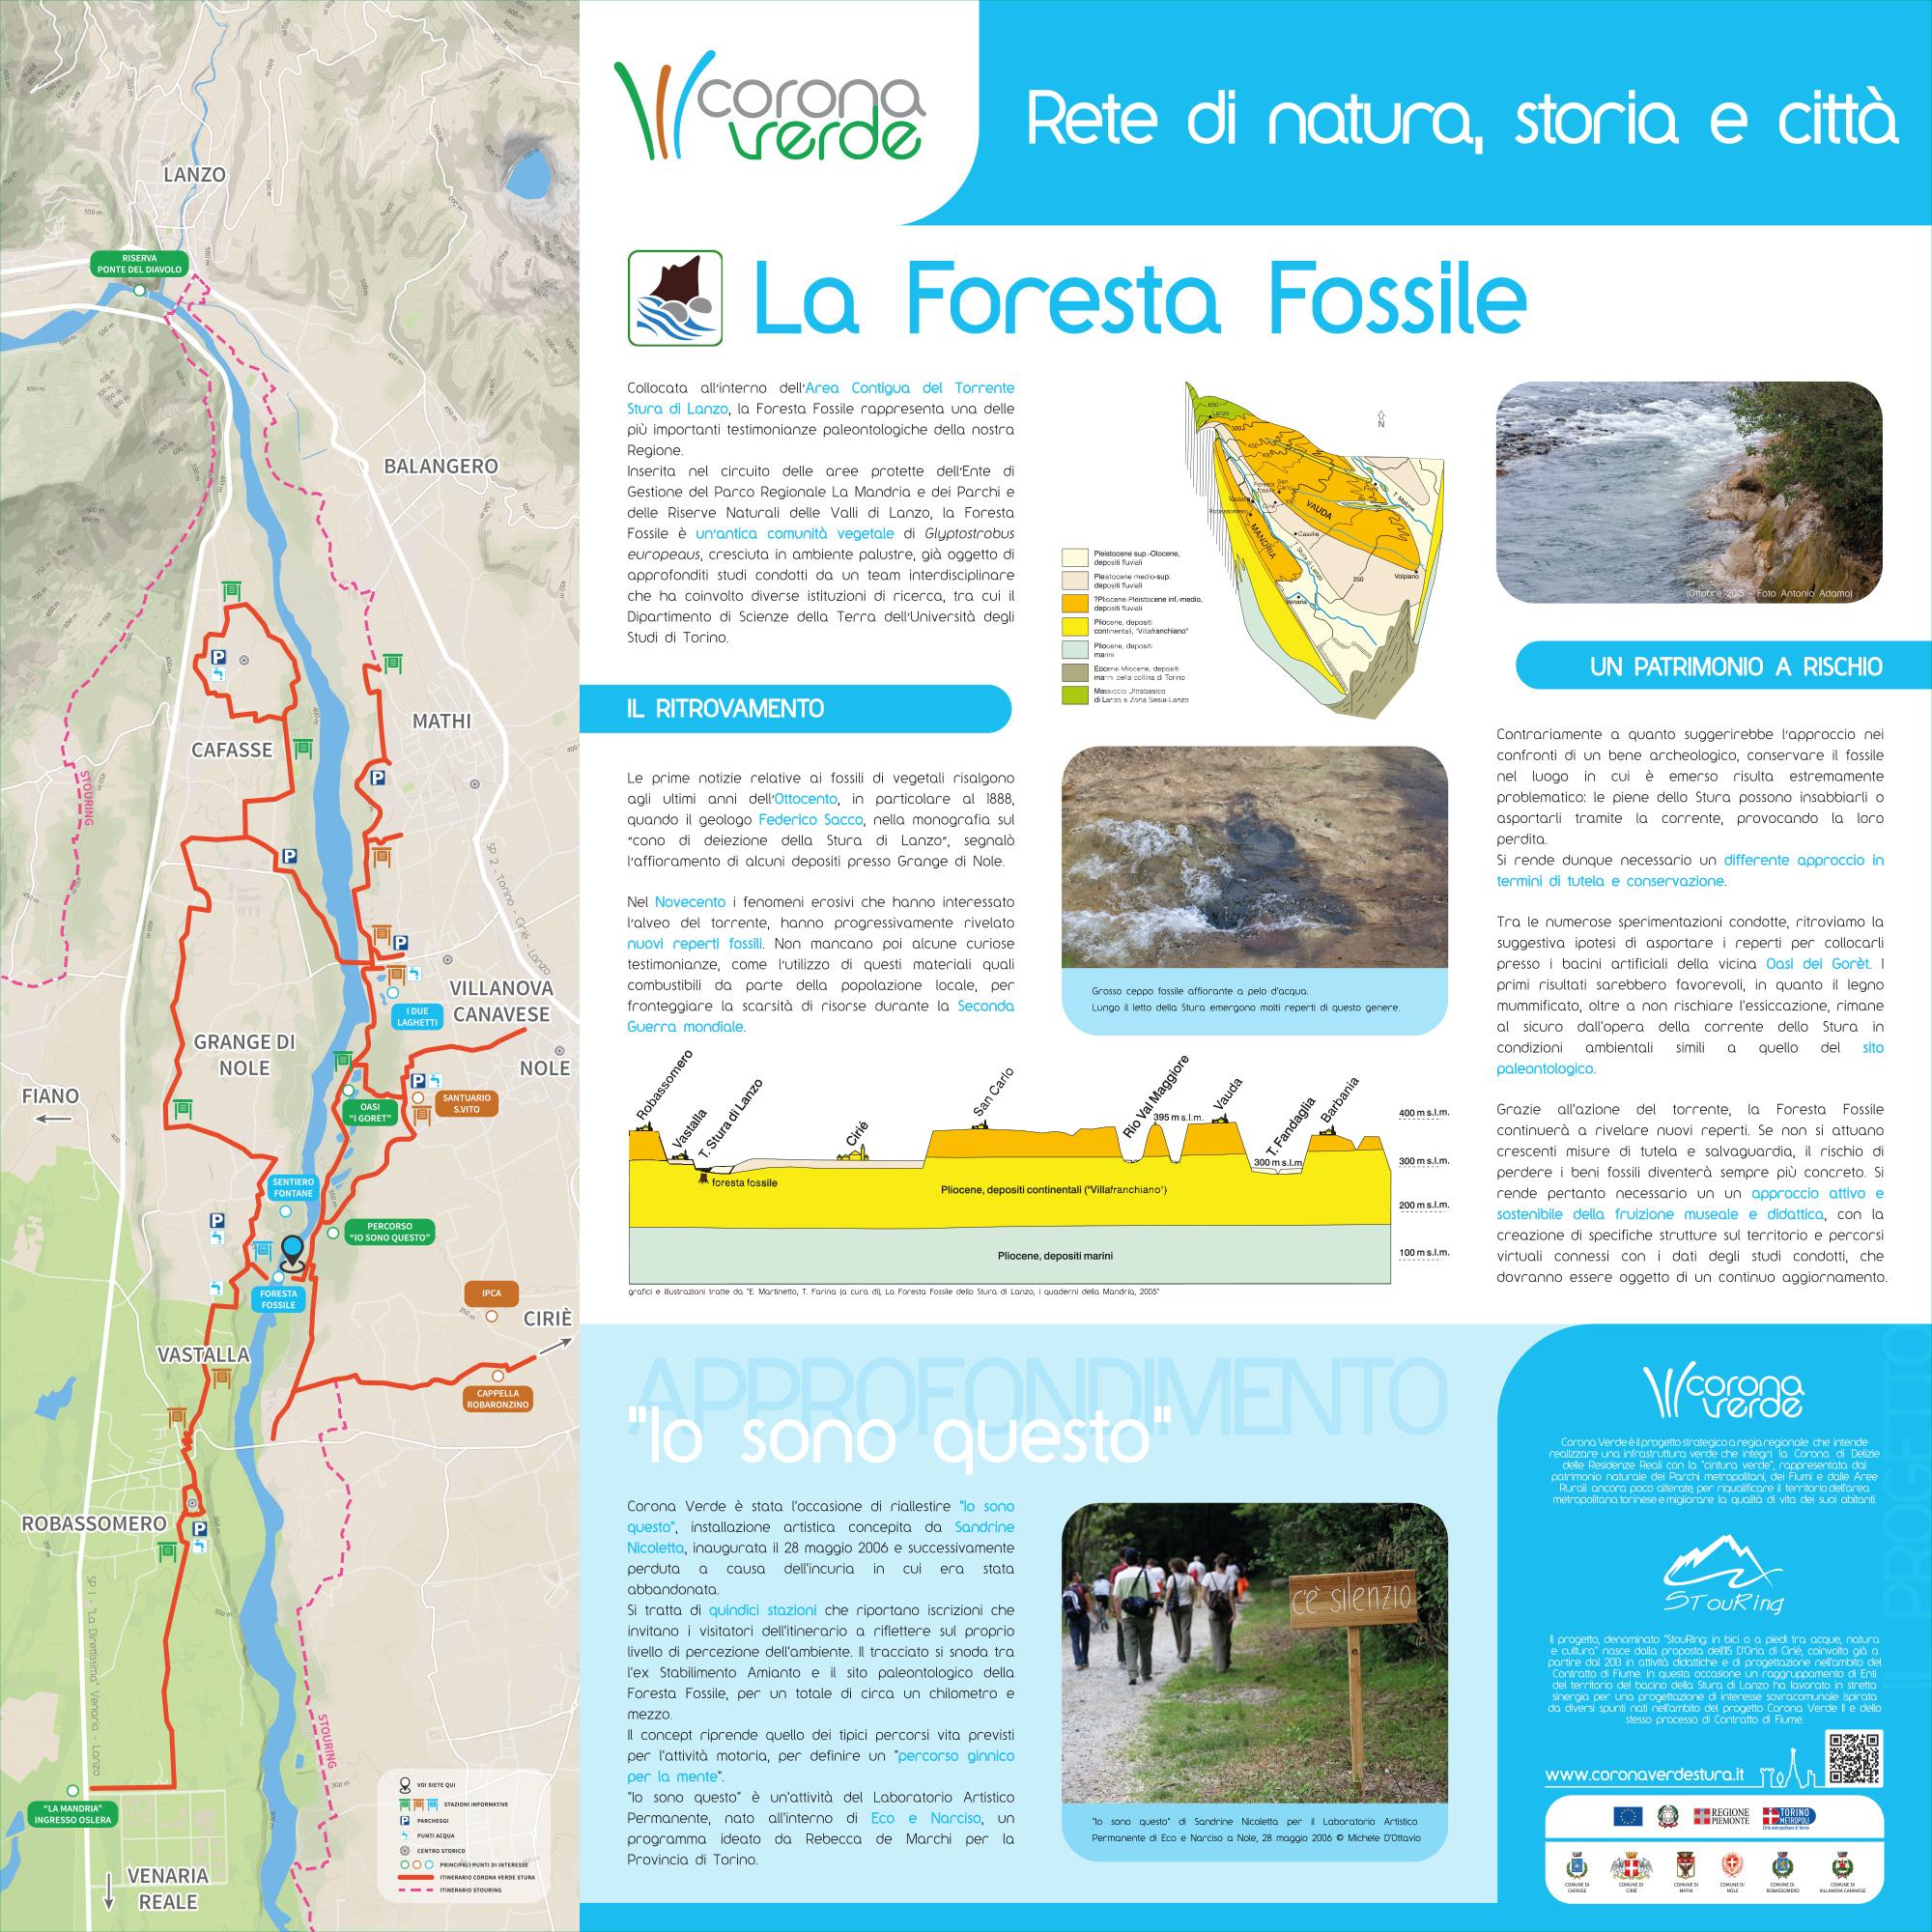 Nole - Foresta Fossile